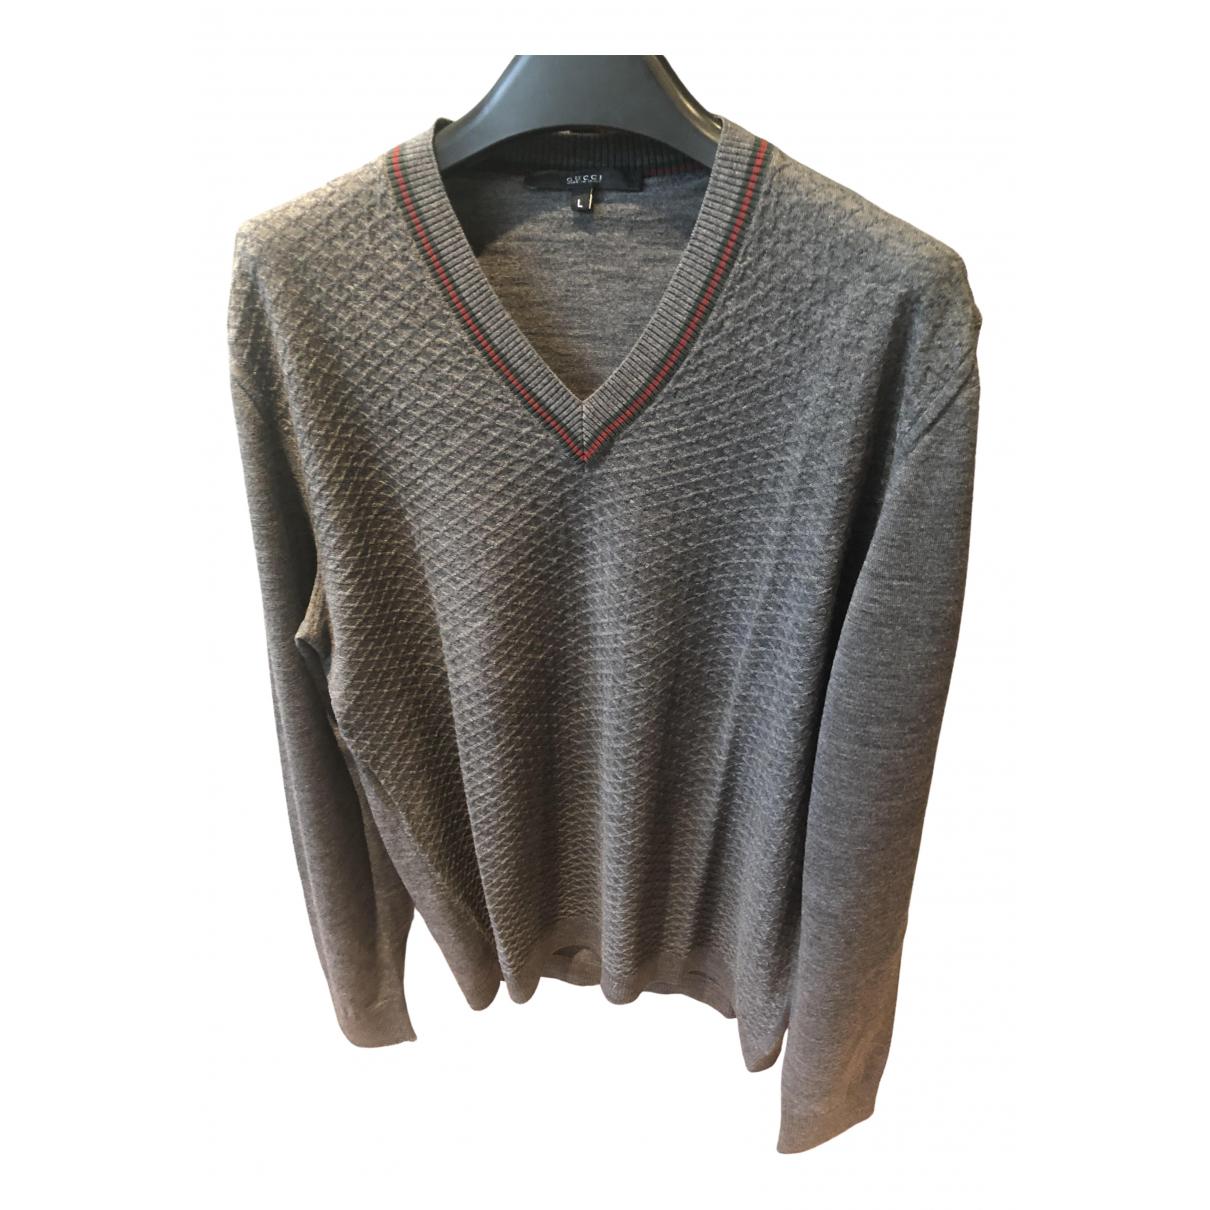 Gucci \N Grey Wool Knitwear & Sweatshirts for Men L International